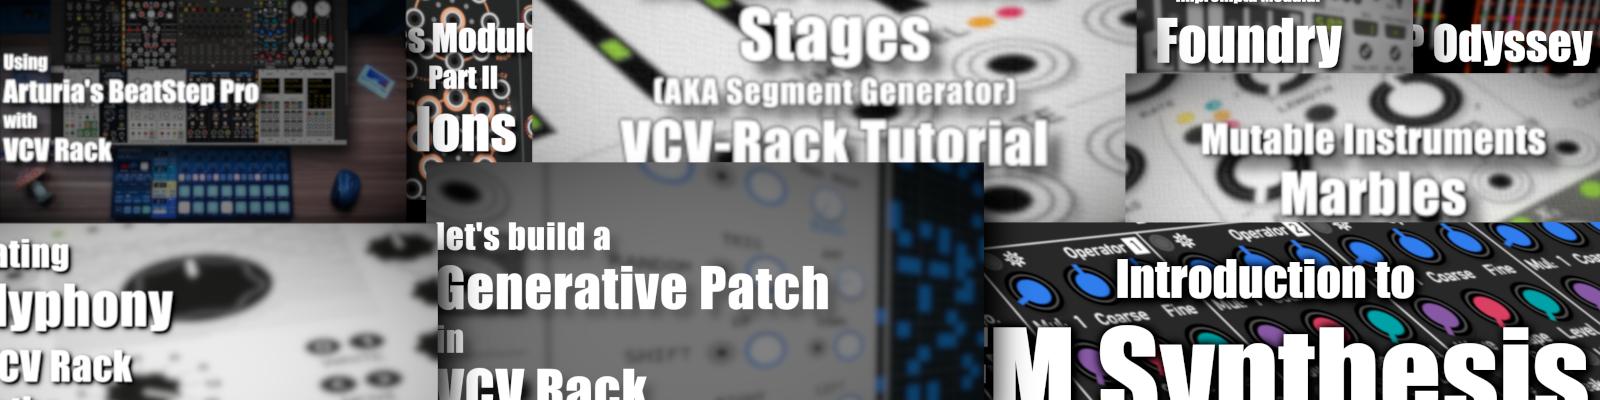 VCV Rack